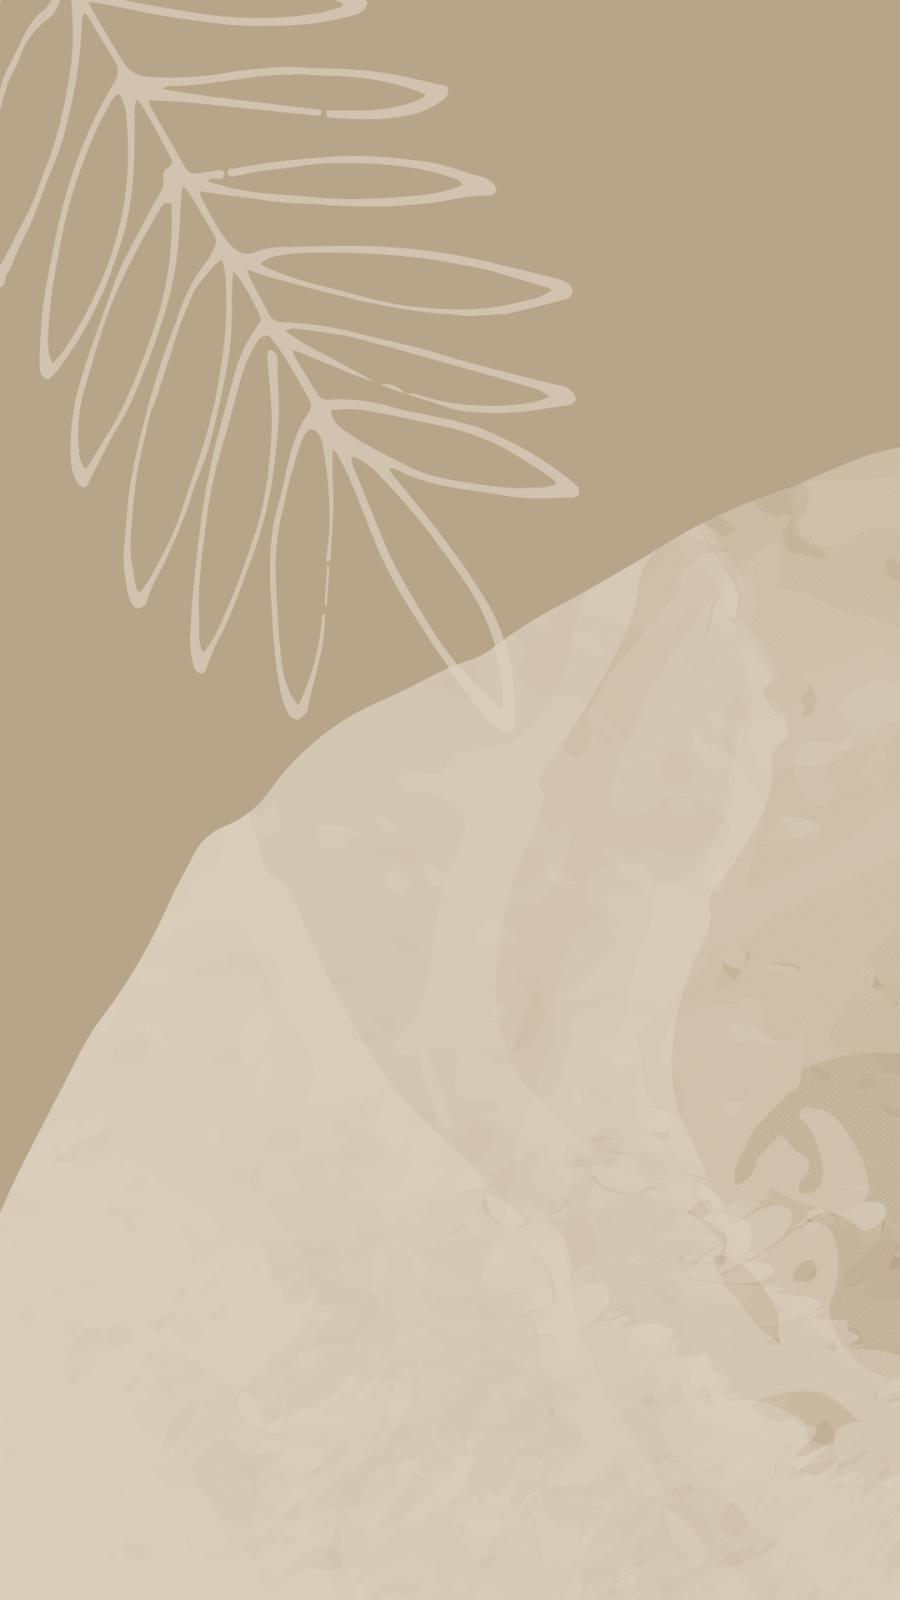 Free Aesthetic iPhone Backgrounds & Widgets